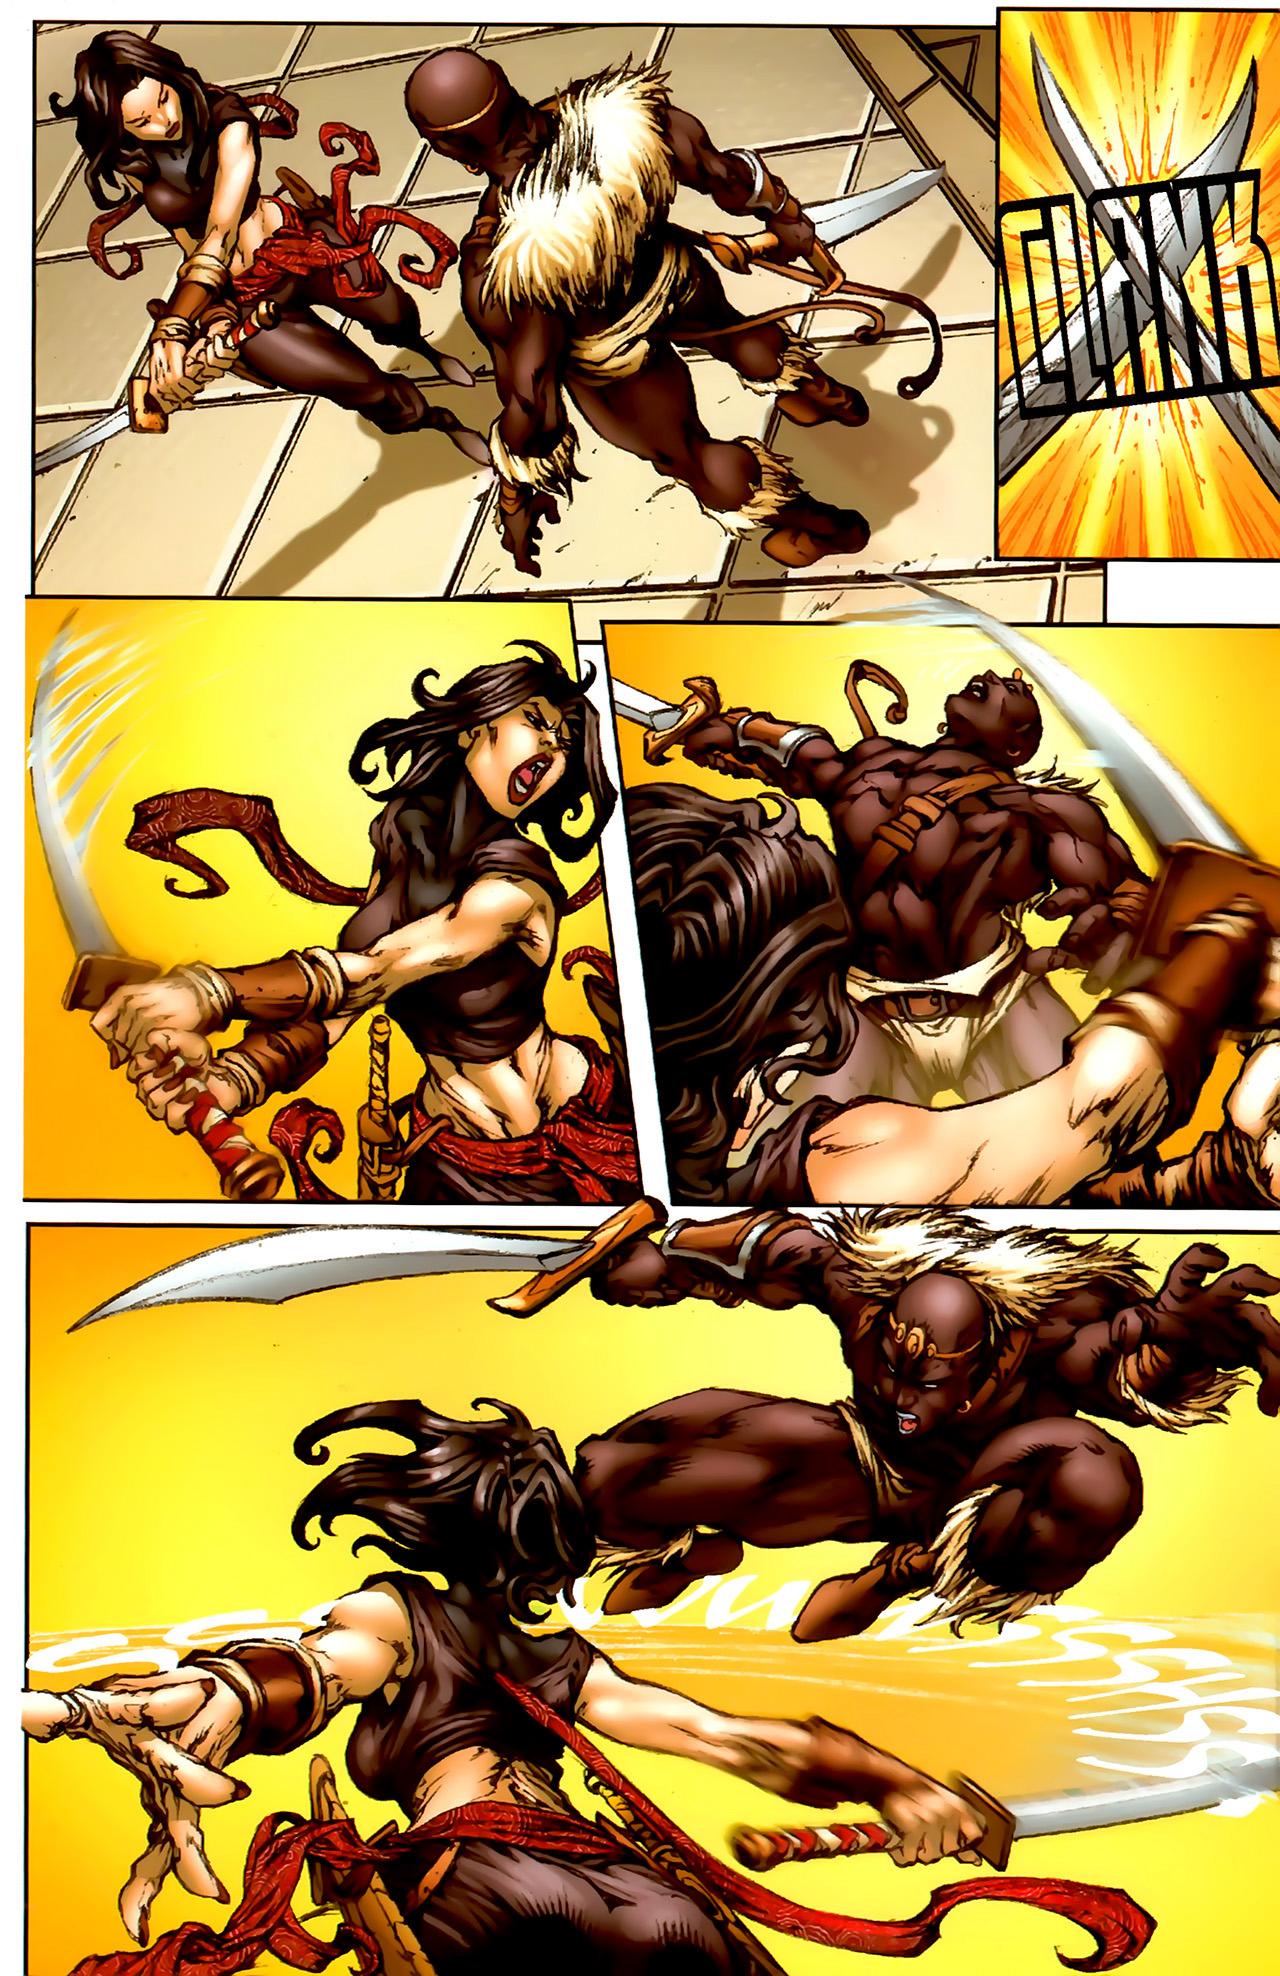 Read online 1001 Arabian Nights: The Adventures of Sinbad comic -  Issue #1 - 21